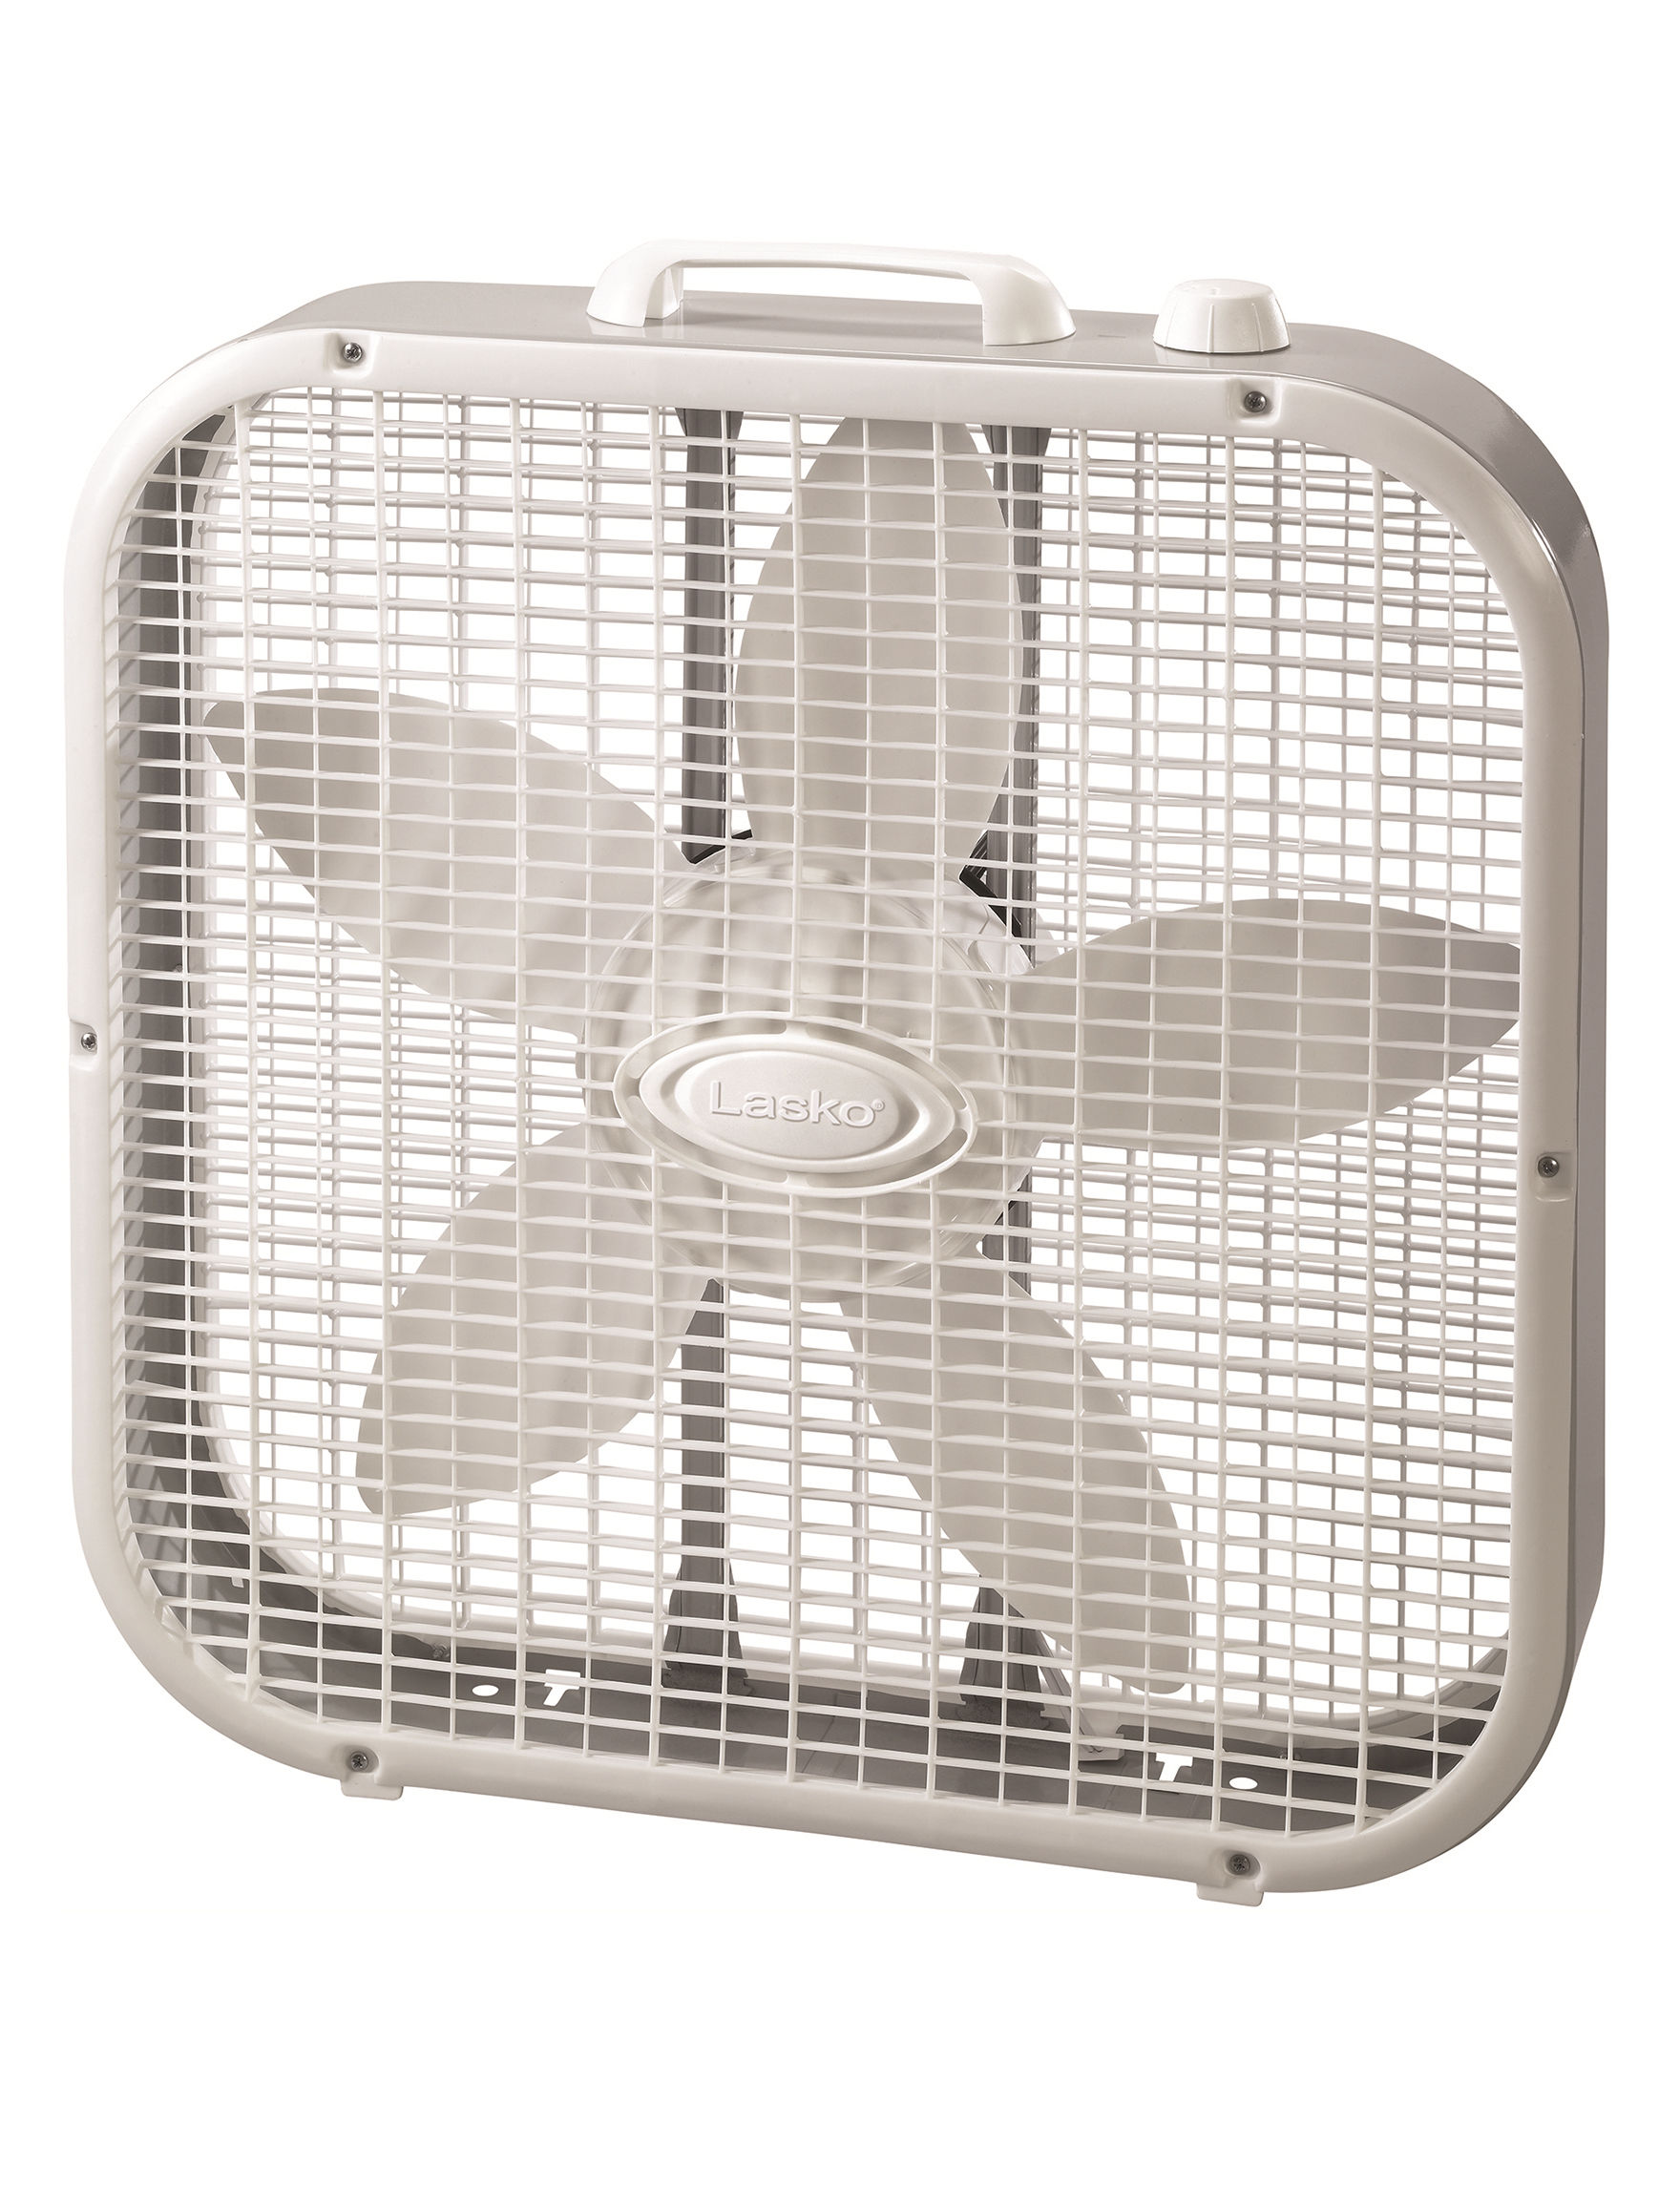 Lasko Grey Fans Heating & Cooling